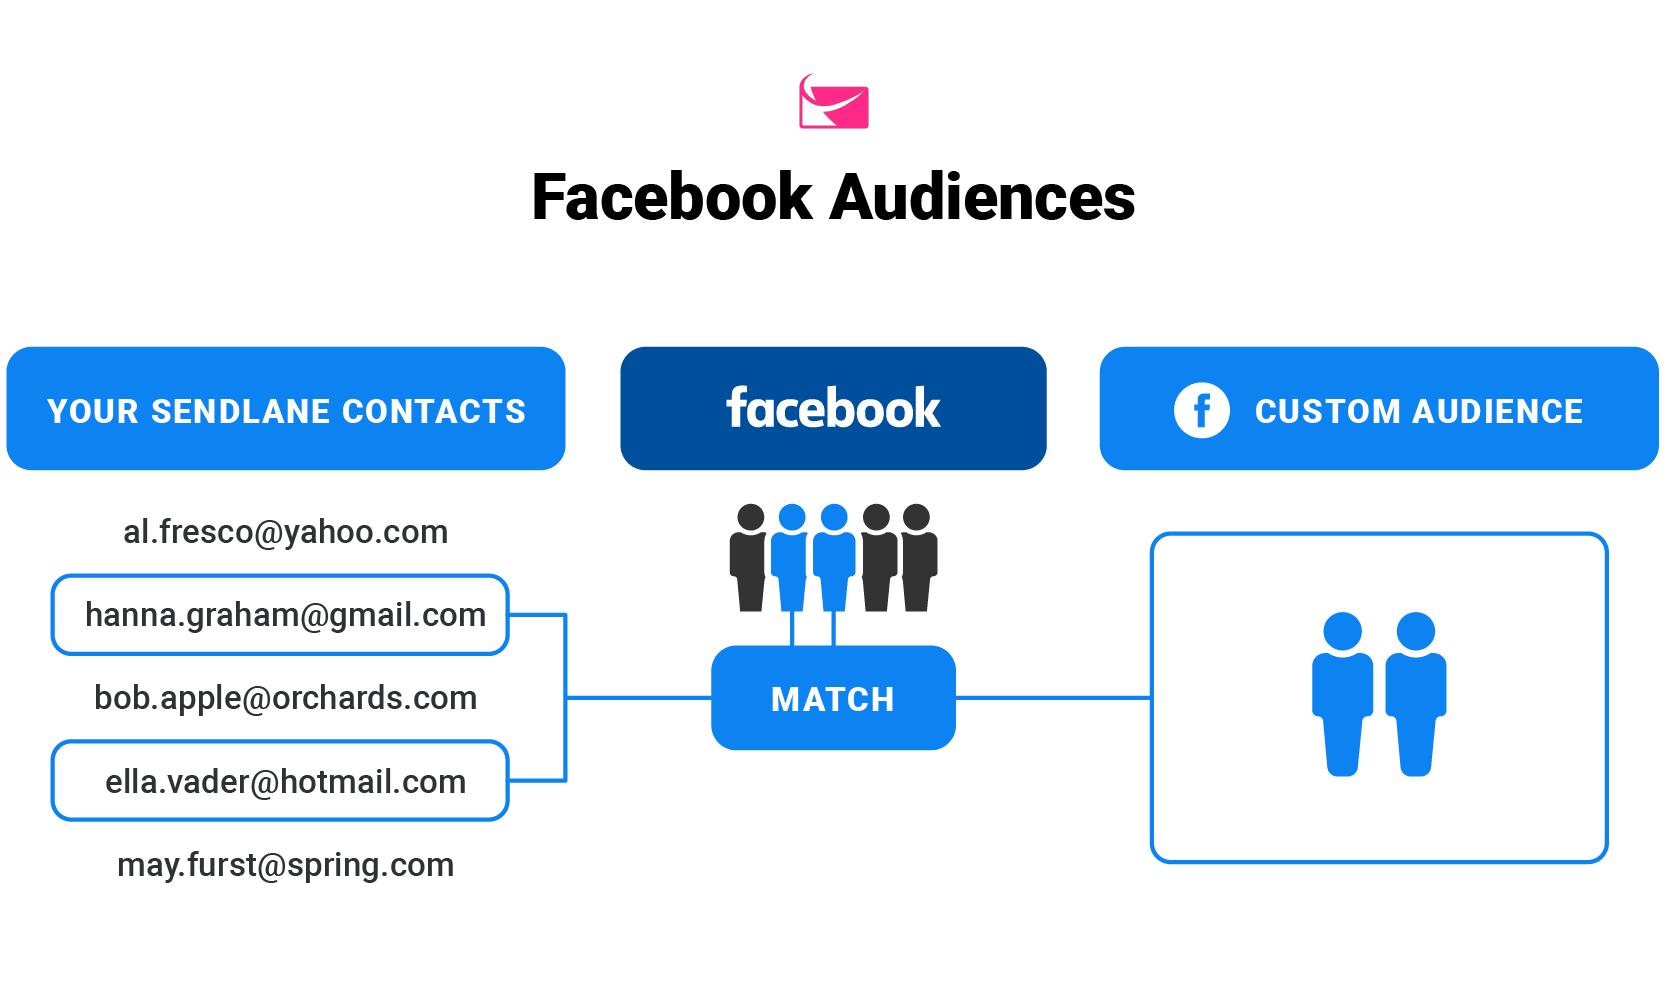 sendlane_facebook_audiences_integration